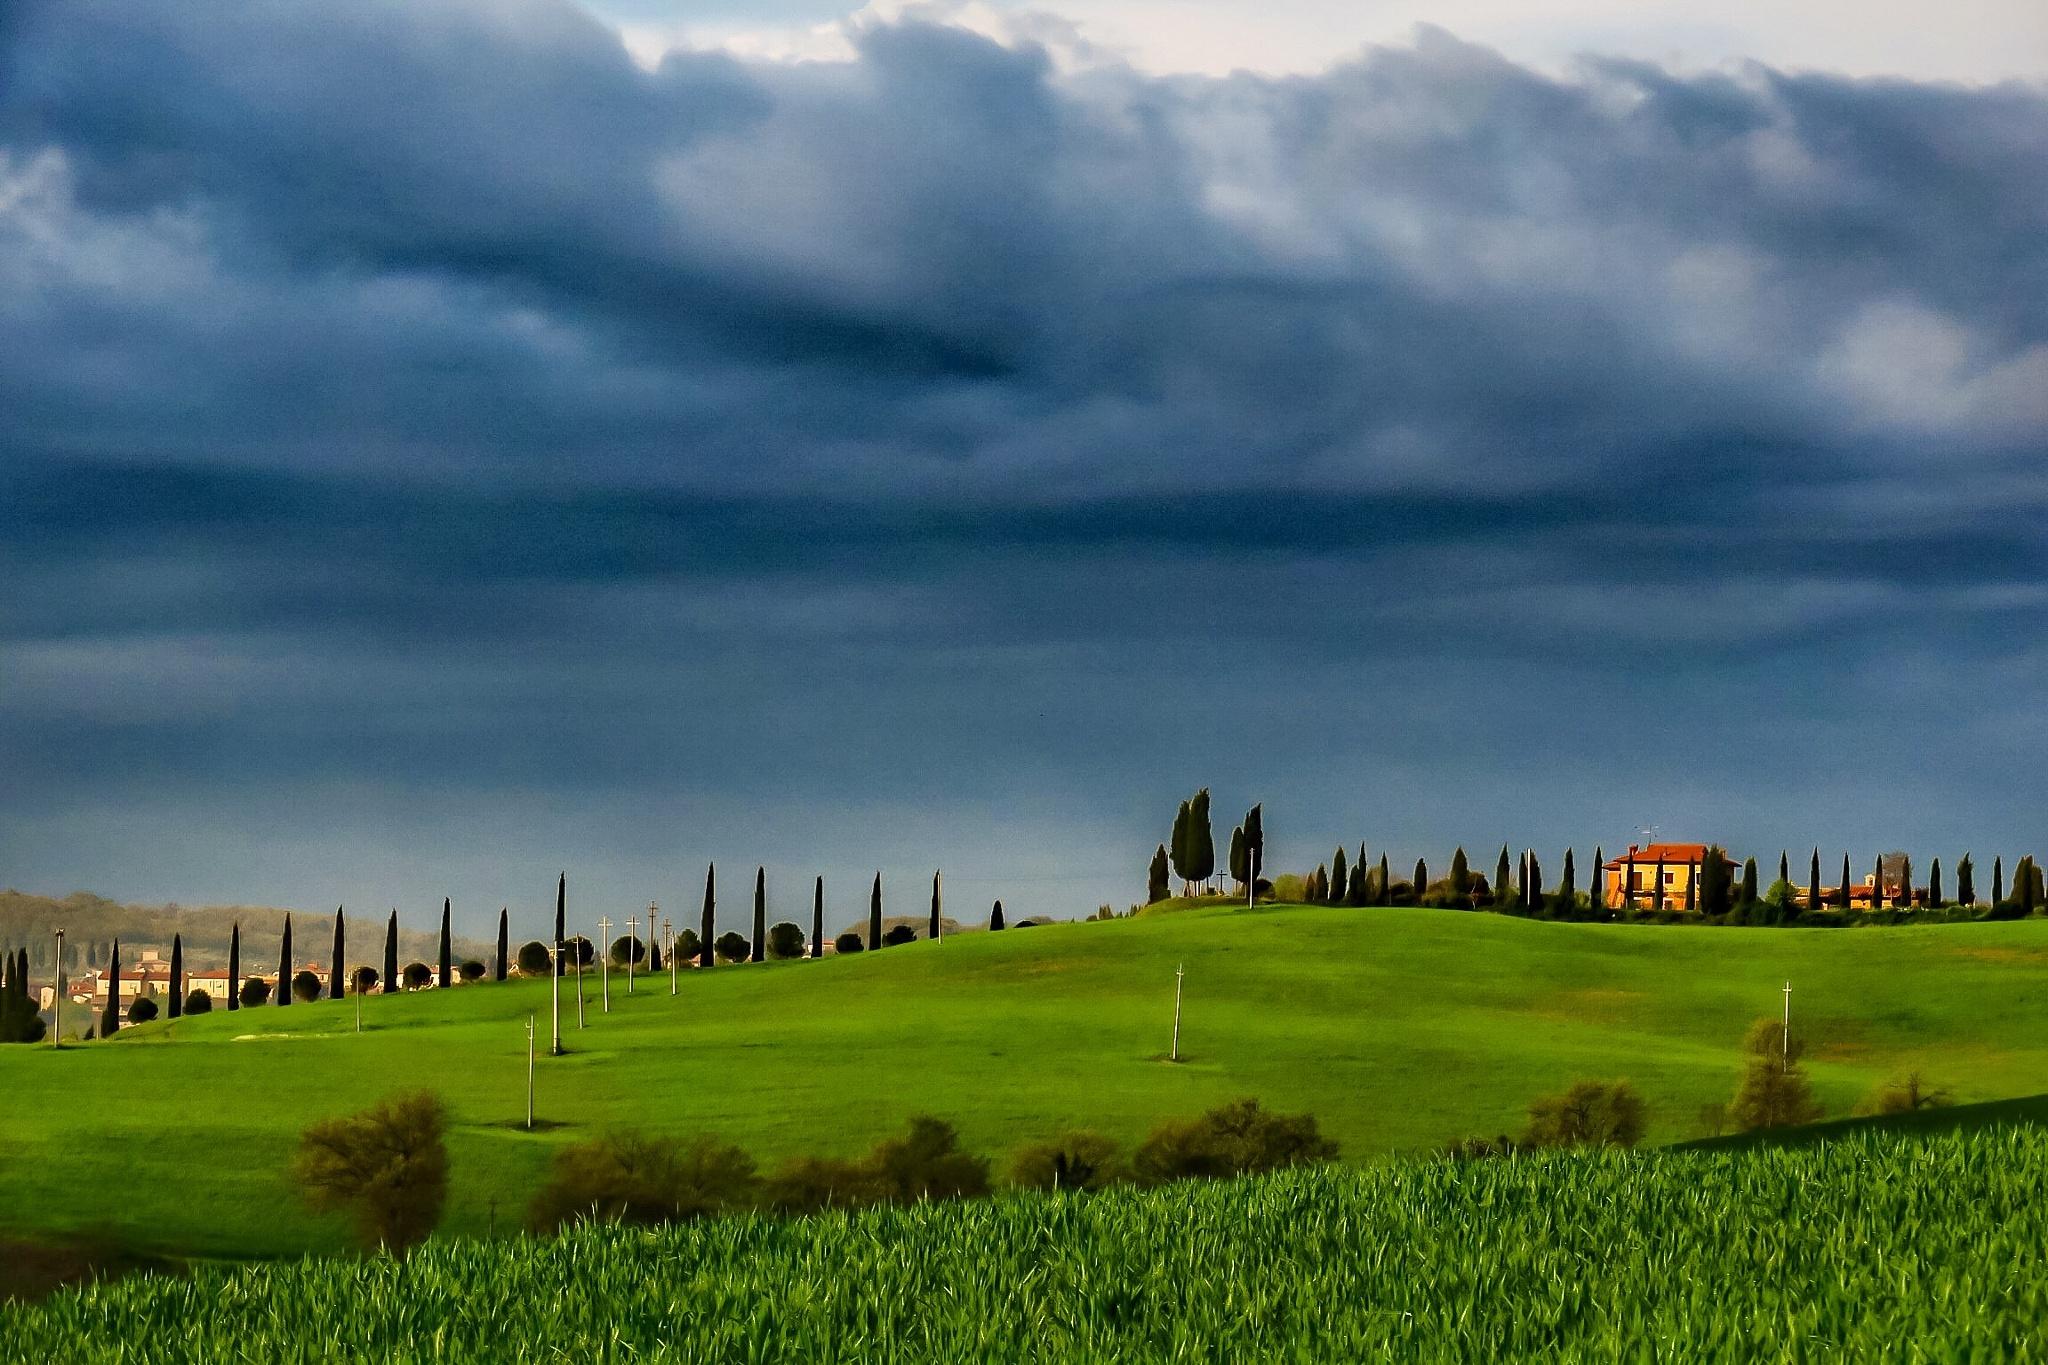 1/3 green,2/3 cloudy blue by Adi Gli